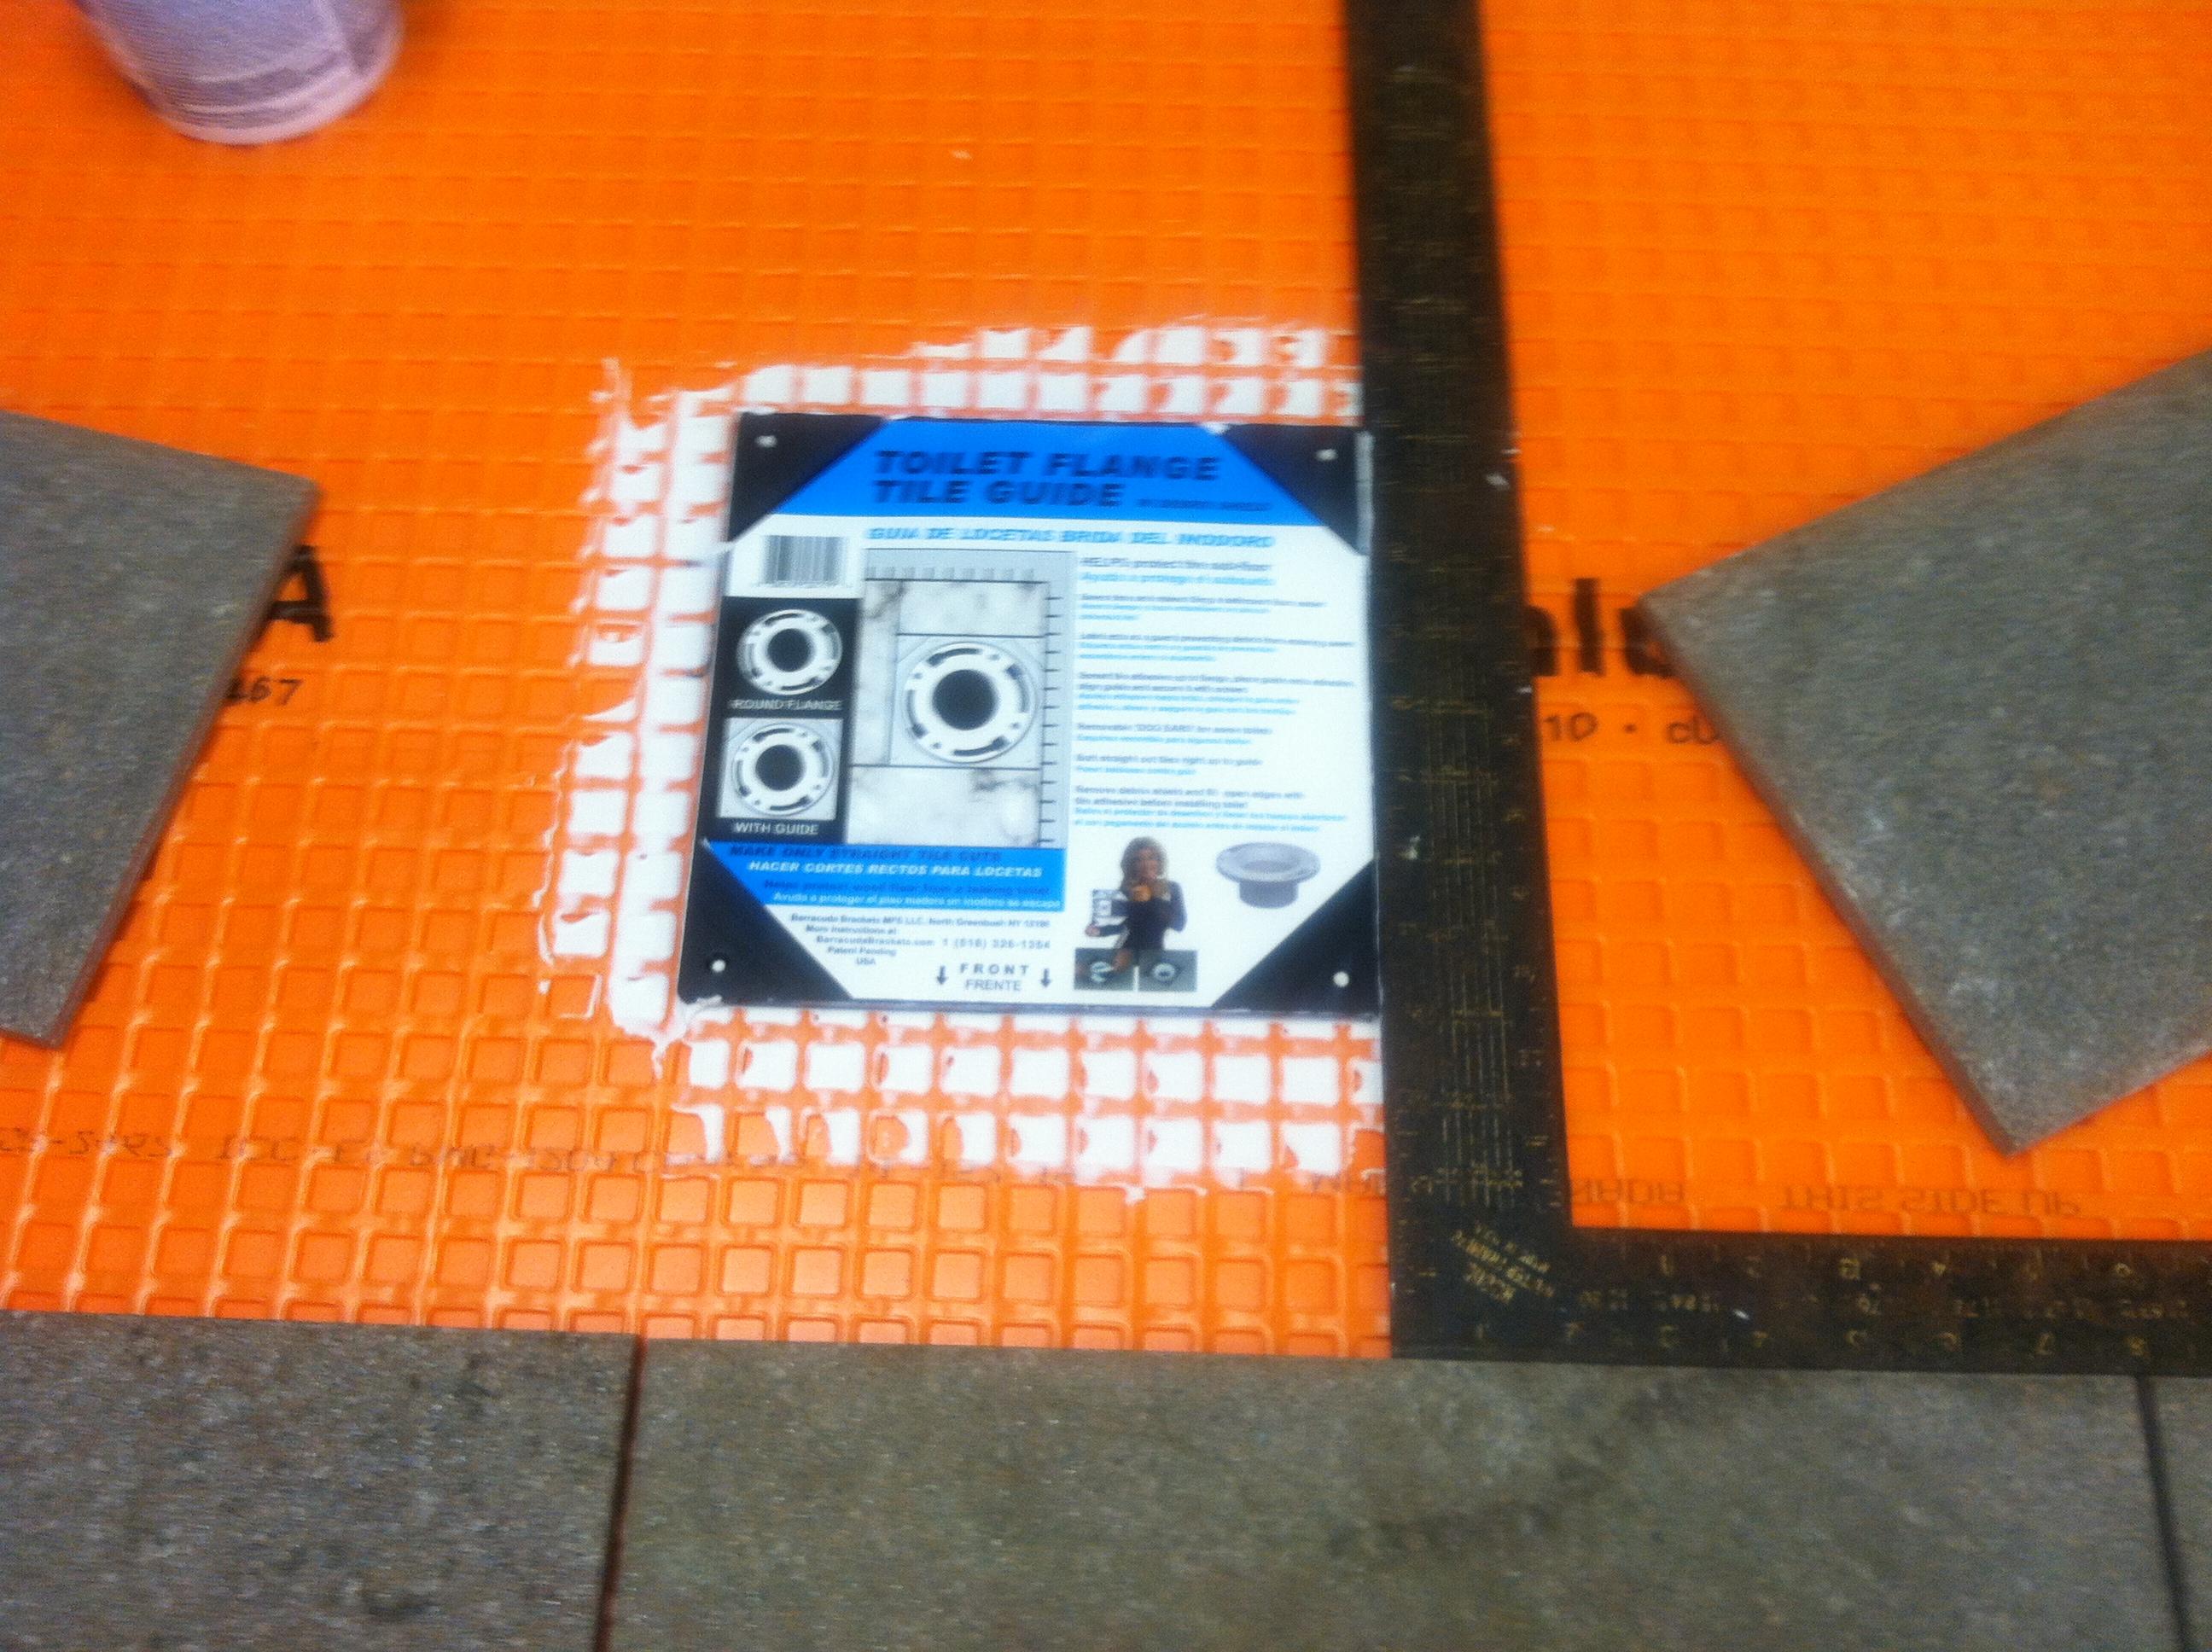 Toilet Flange Tile Guide Instructions Barracuda Brackets